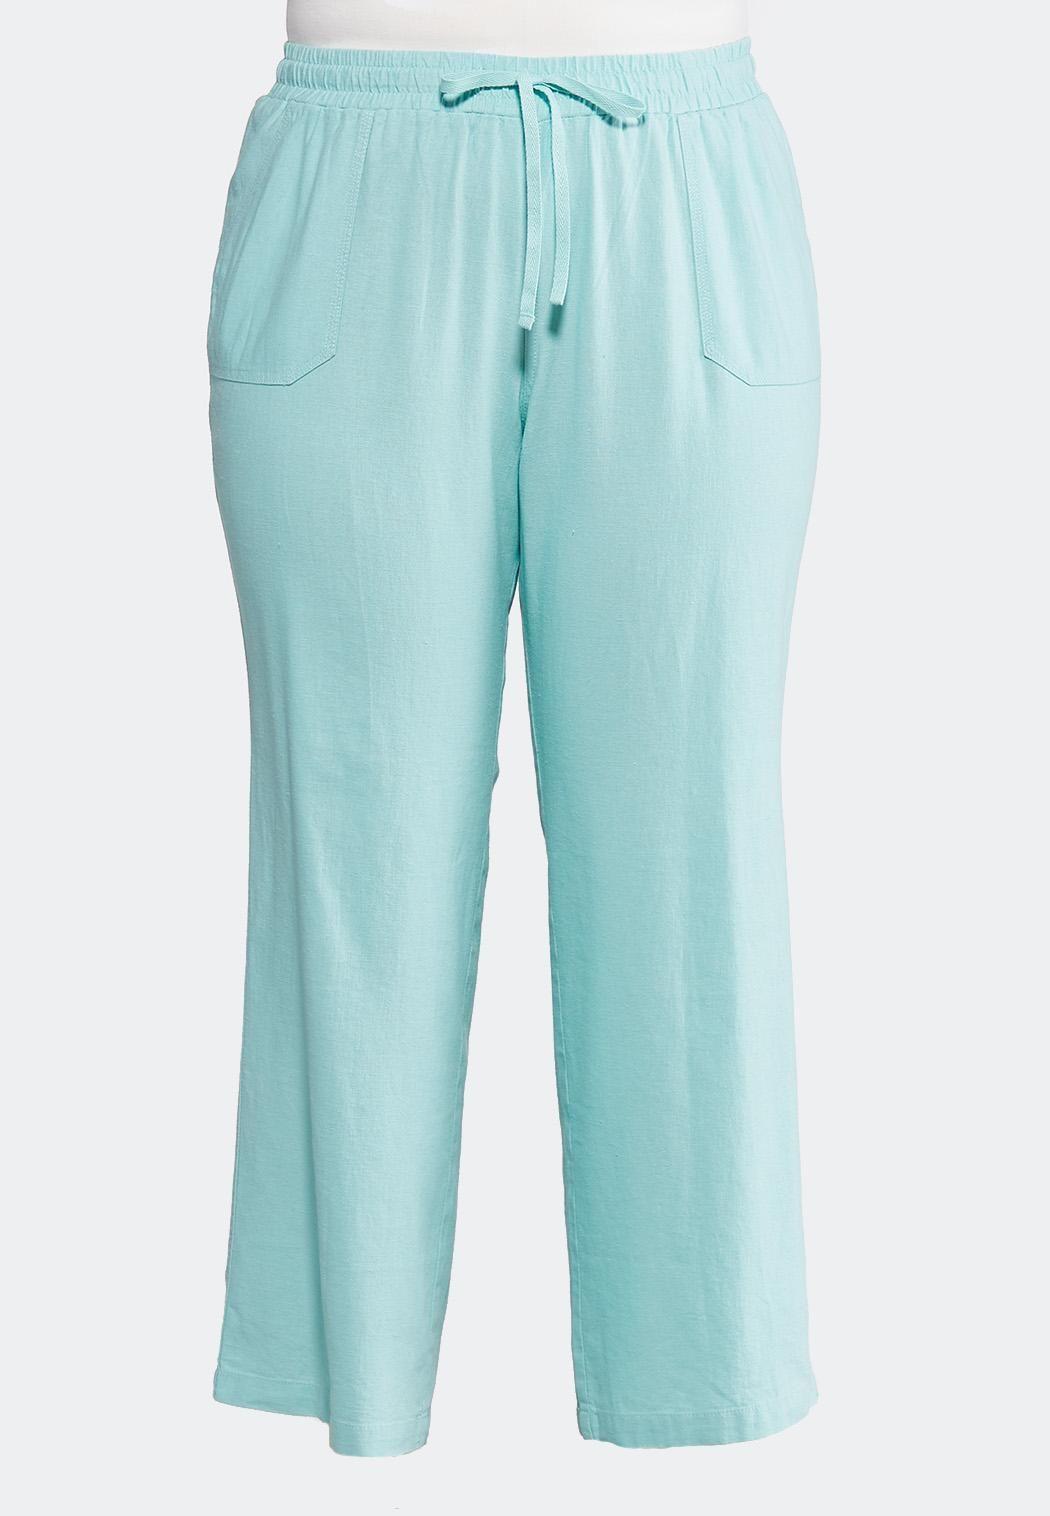 1d1ff2660f Plus Size Drawstring Linen Pants Pants Cato Fashions in 2019 ...